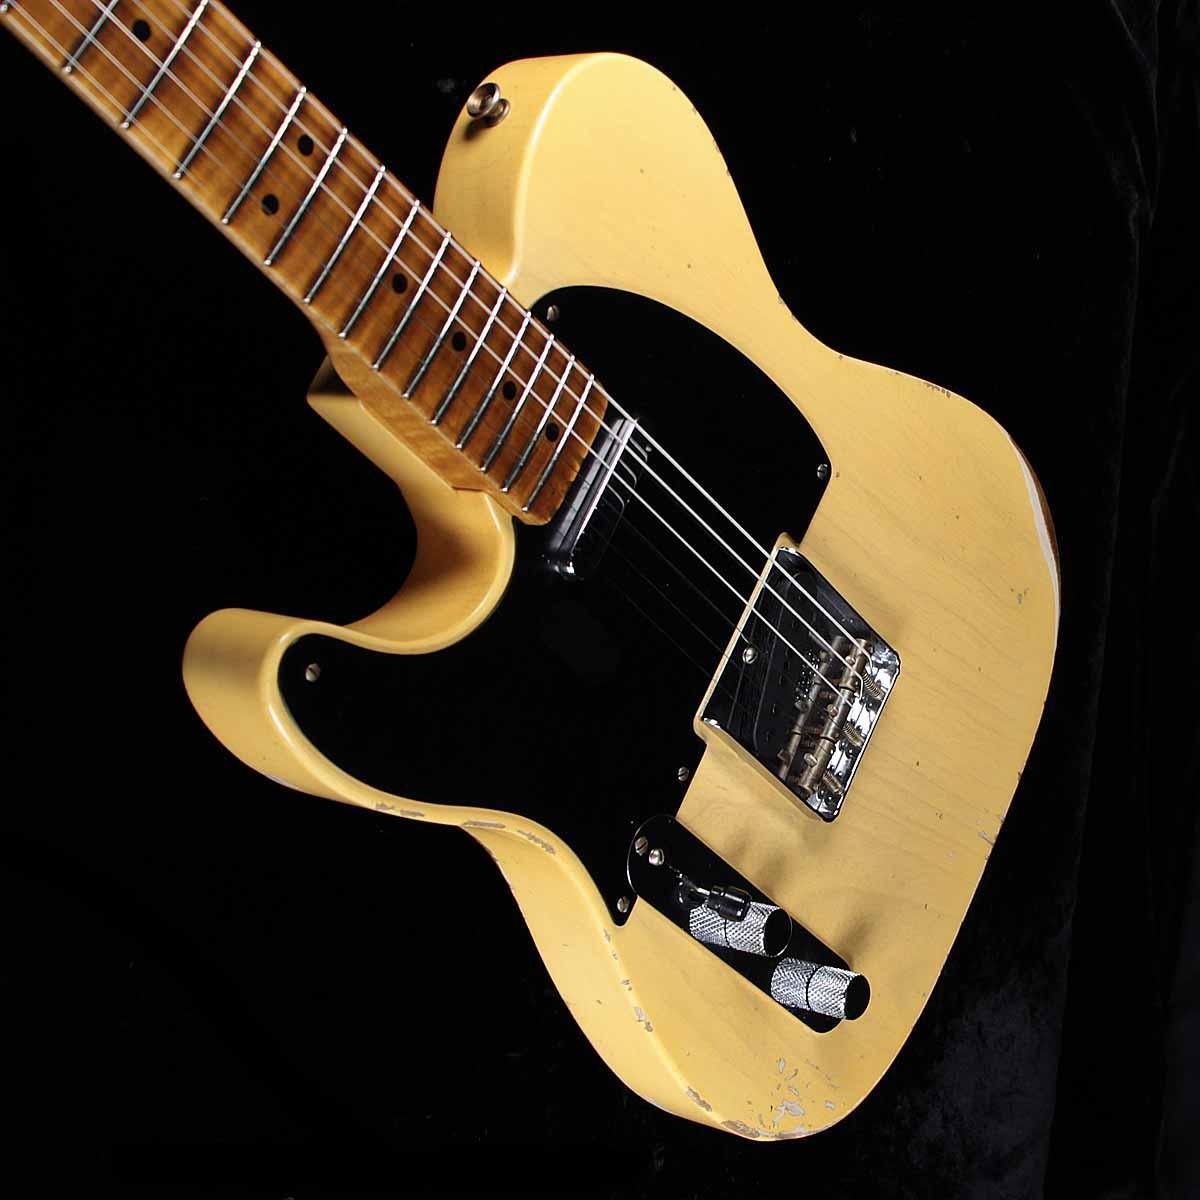 Fender Custom Shop 51 Nocaster relic on